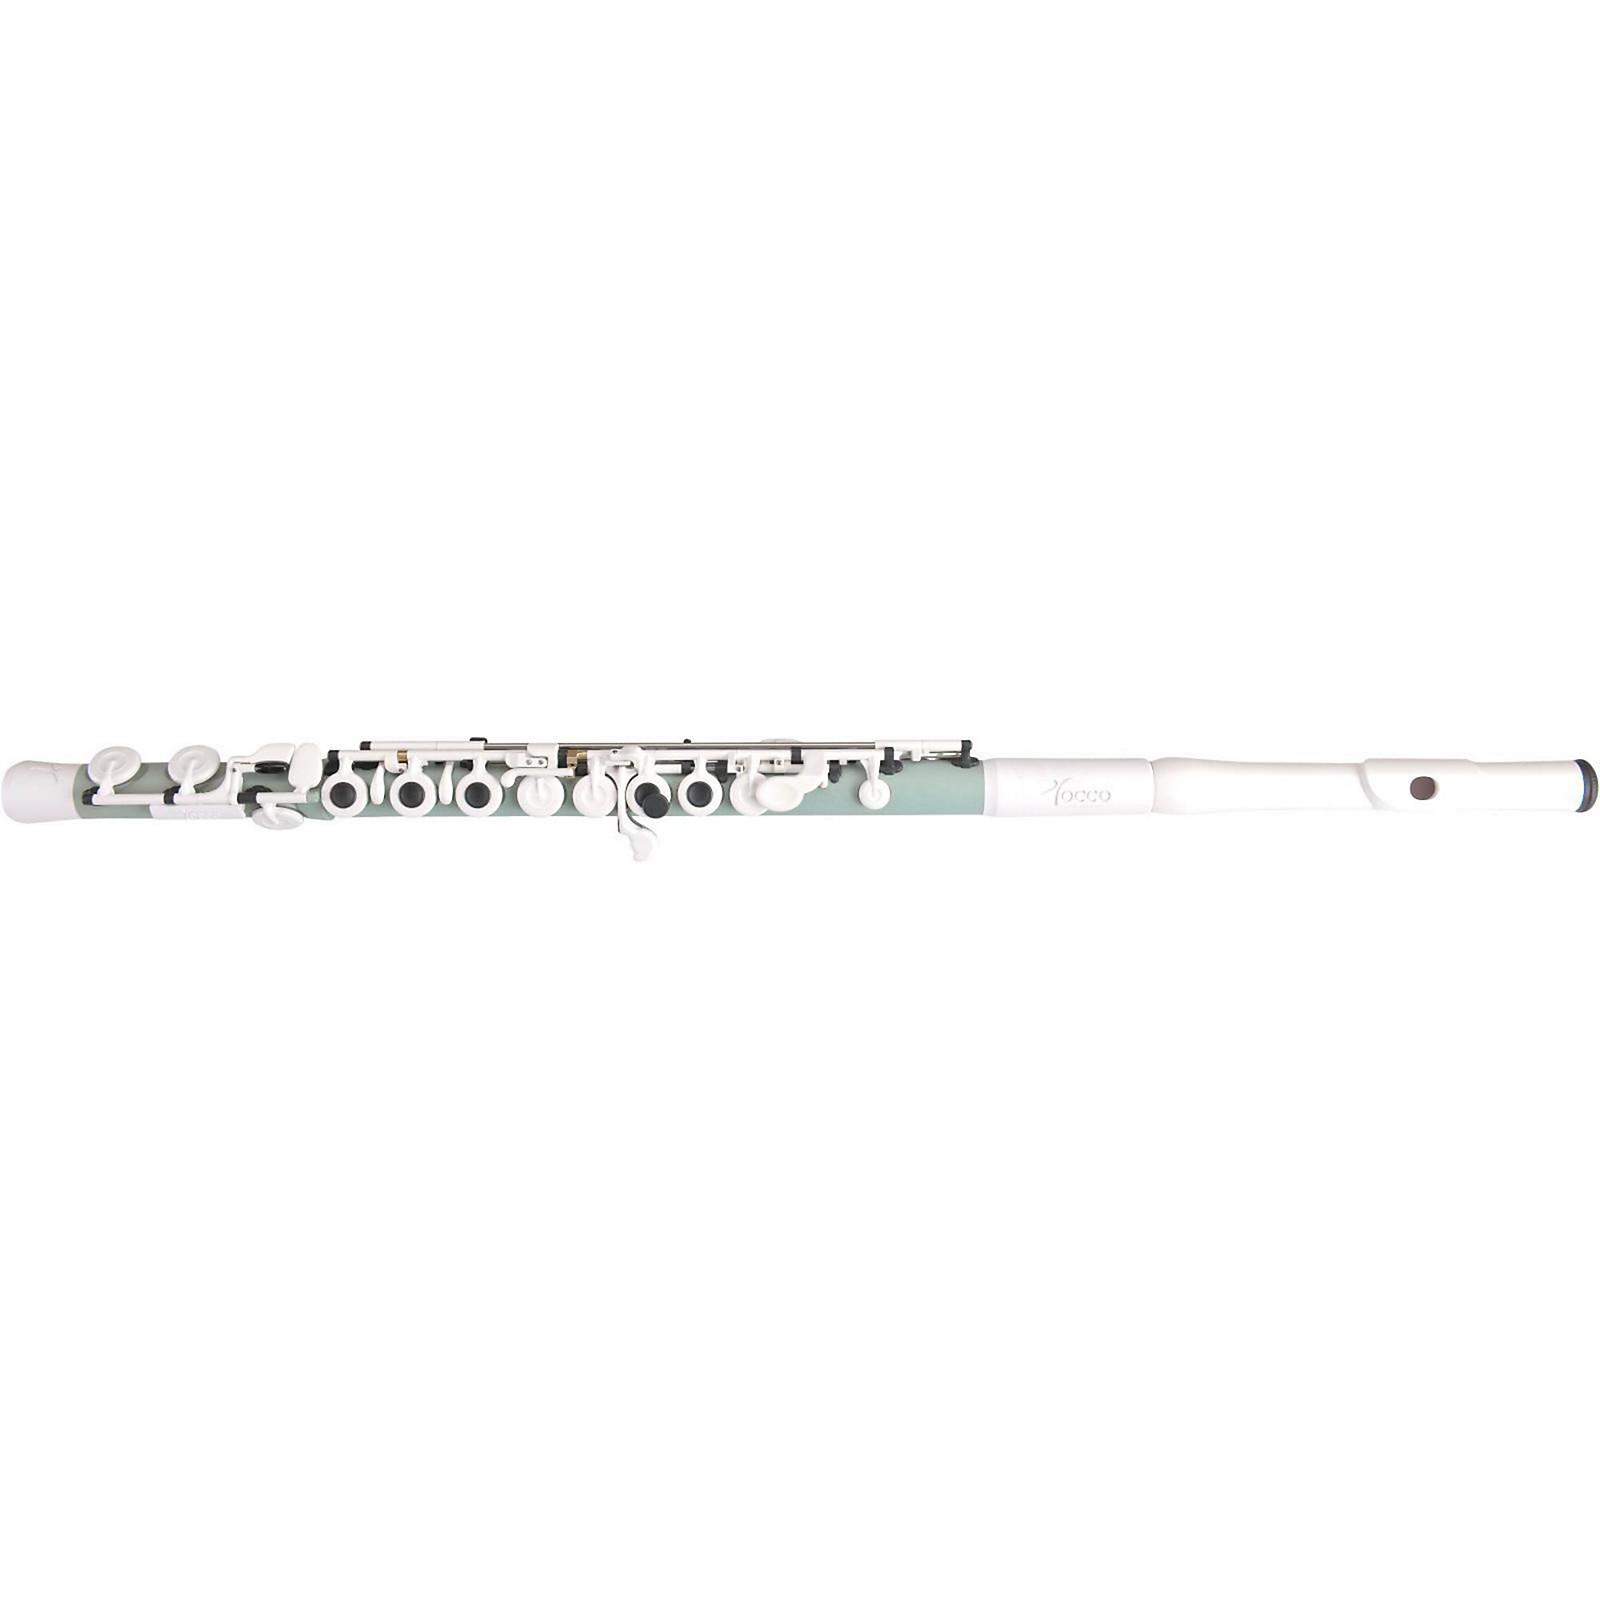 Guo Tocco C Flute Plus